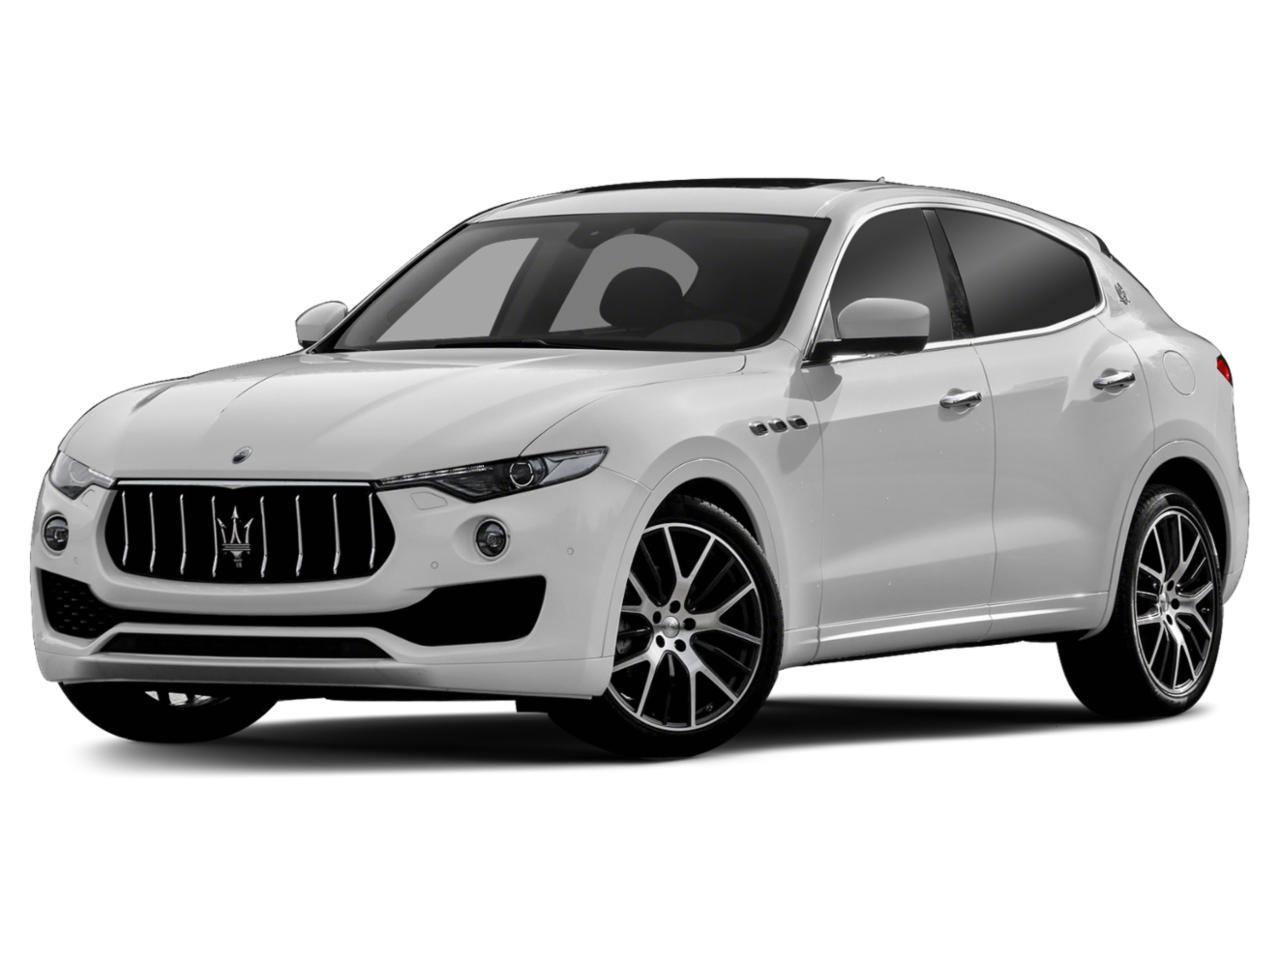 2018 Maserati Levante Vehicle Photo in Lewisville,, TX 75067